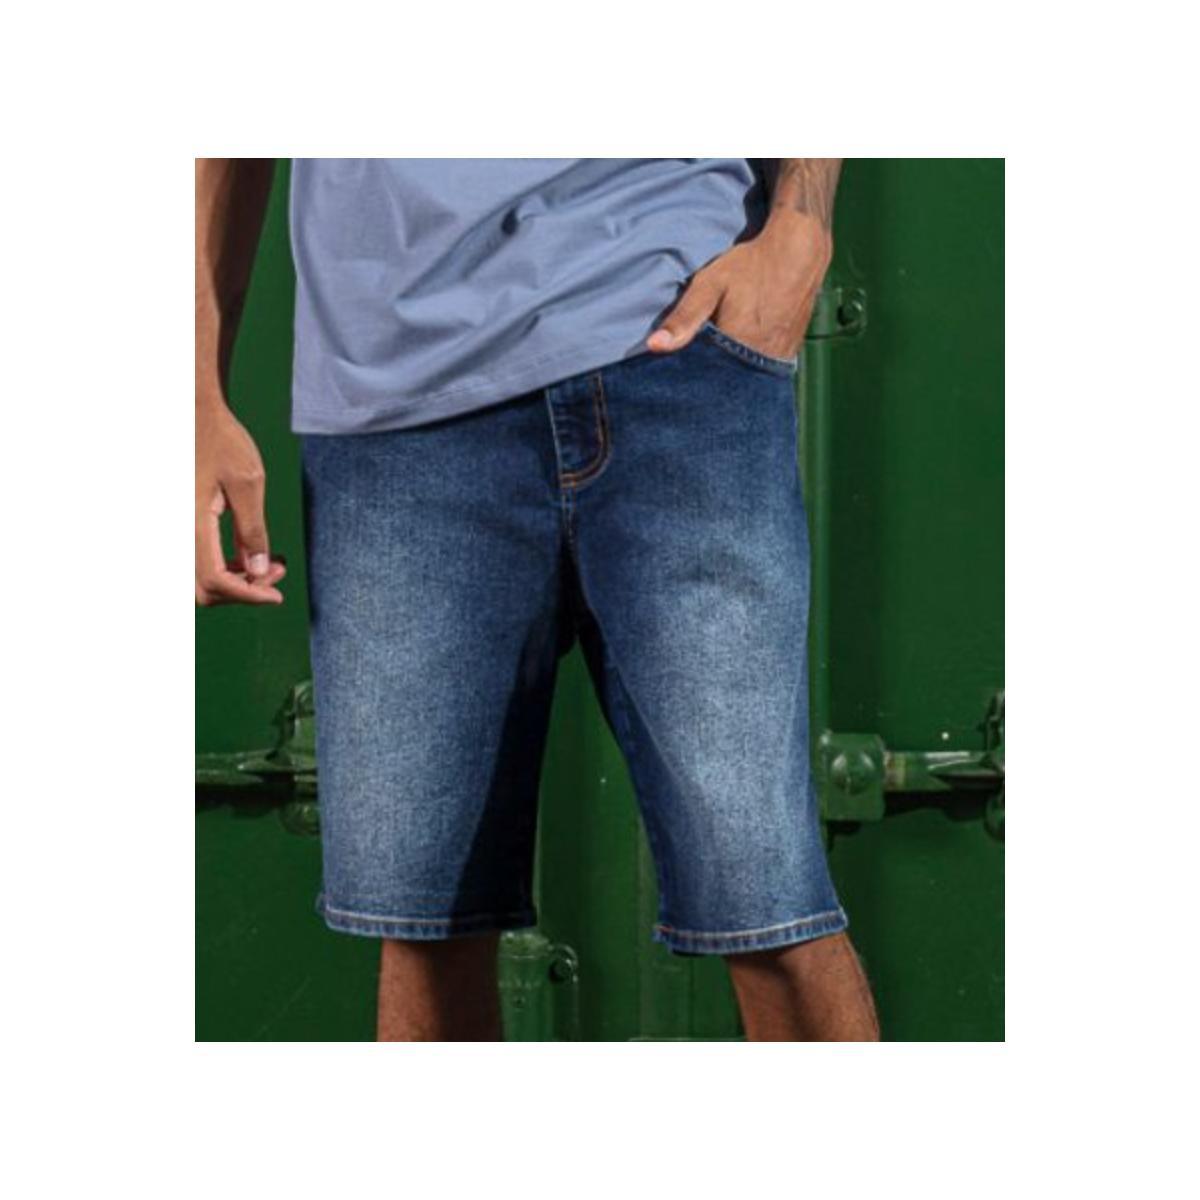 Bermuda Masculina Coca-cola Clothing 33201530 600 Jeans